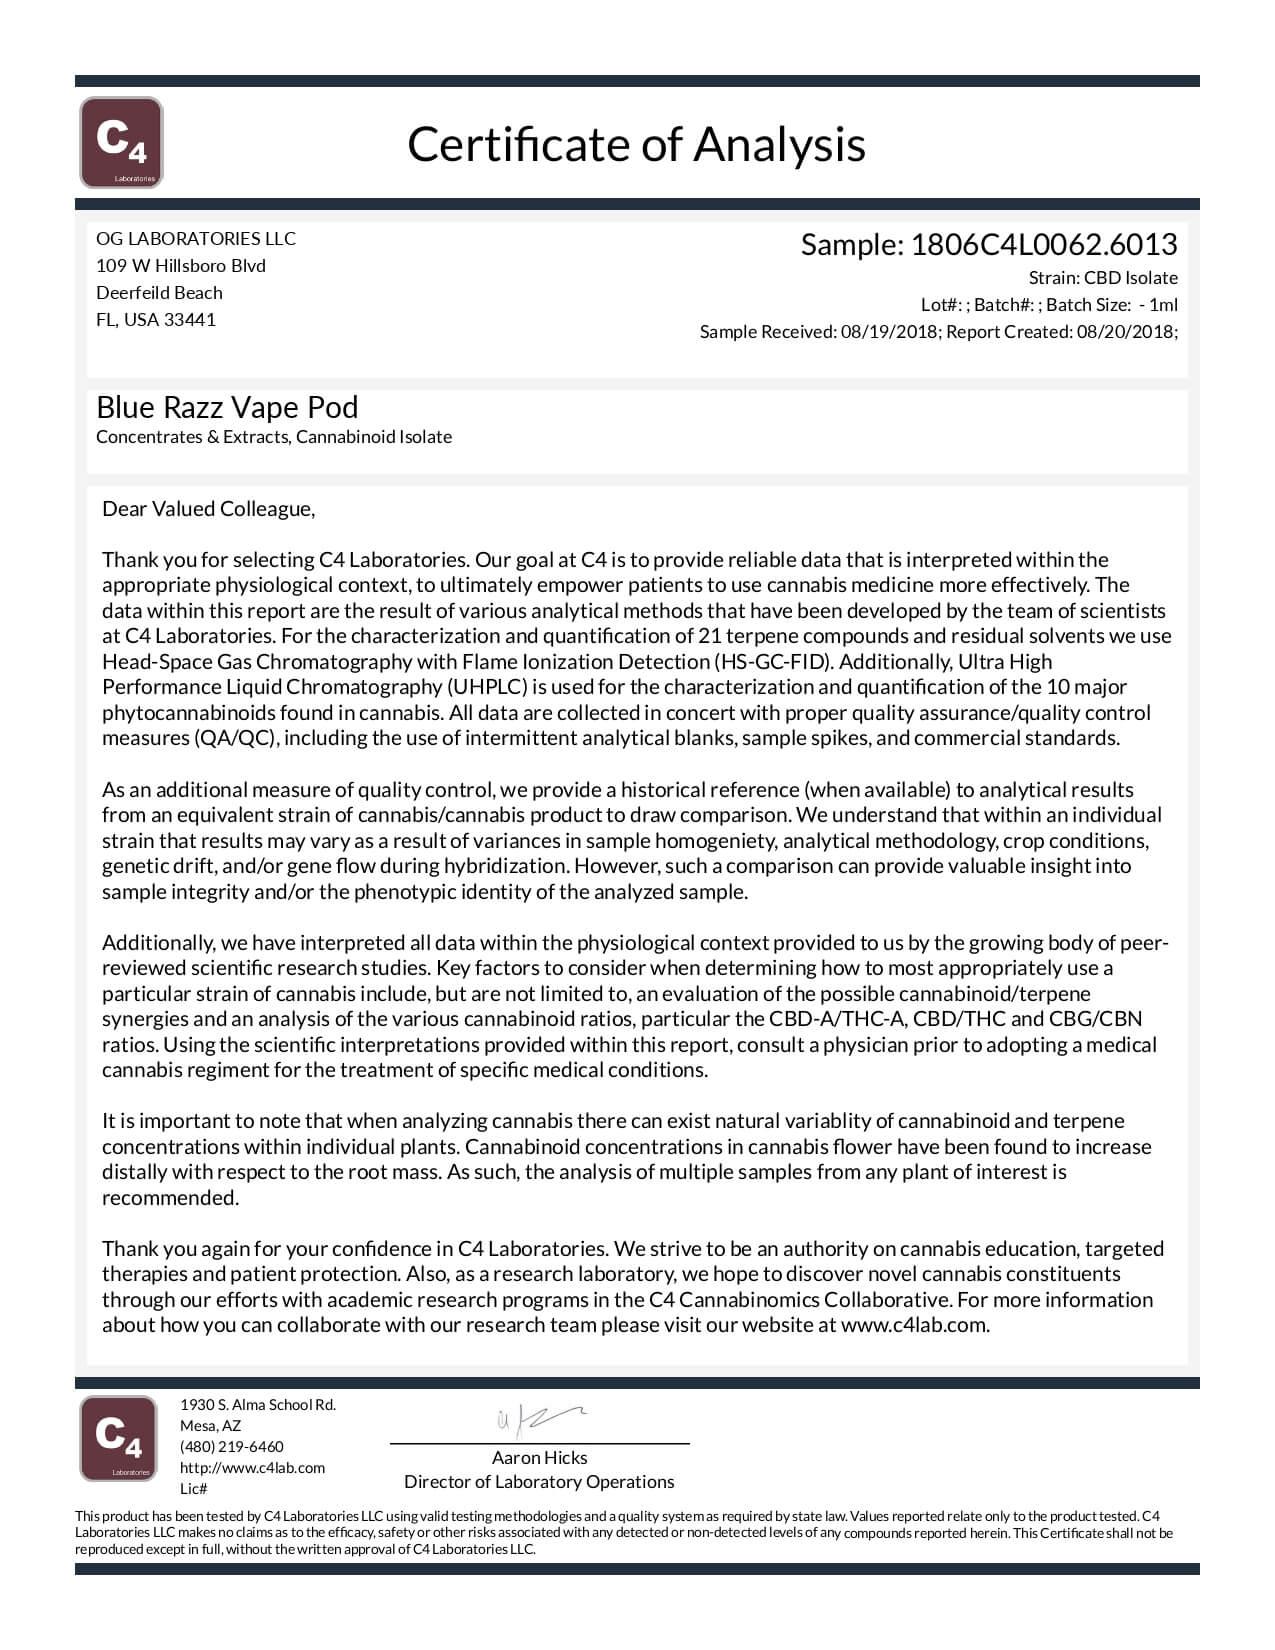 OG Labs CBD Pod Blue Razz Lab Report